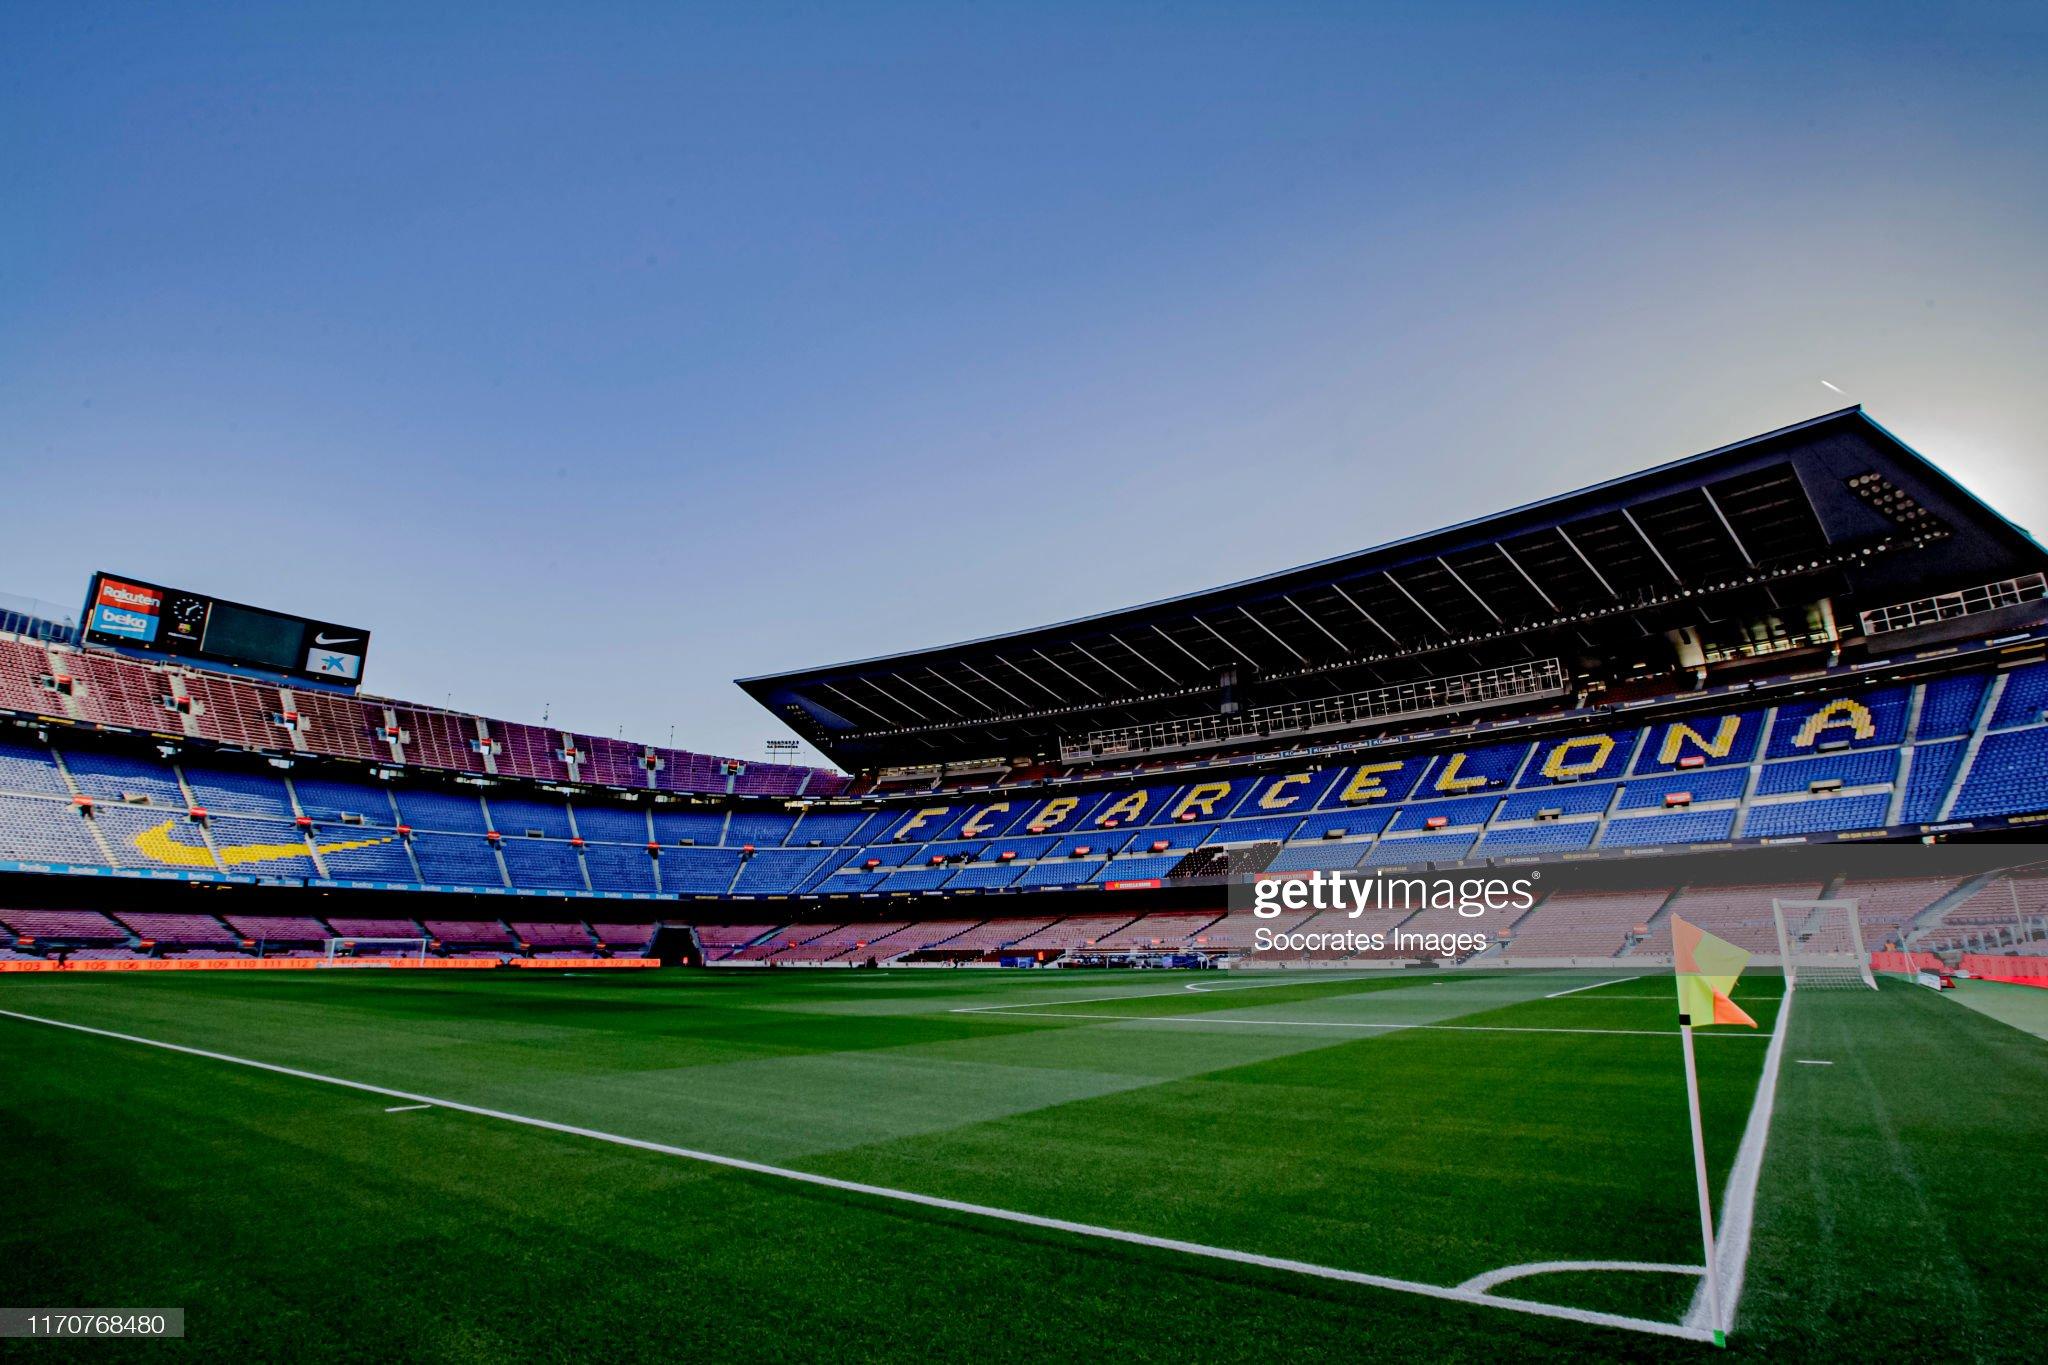 صور مباراة : برشلونة - فياريال 2-1 ( 24-09-2019 )  Stadium-of-fc-barcelona-during-the-la-liga-santander-match-between-fc-picture-id1170768480?s=2048x2048